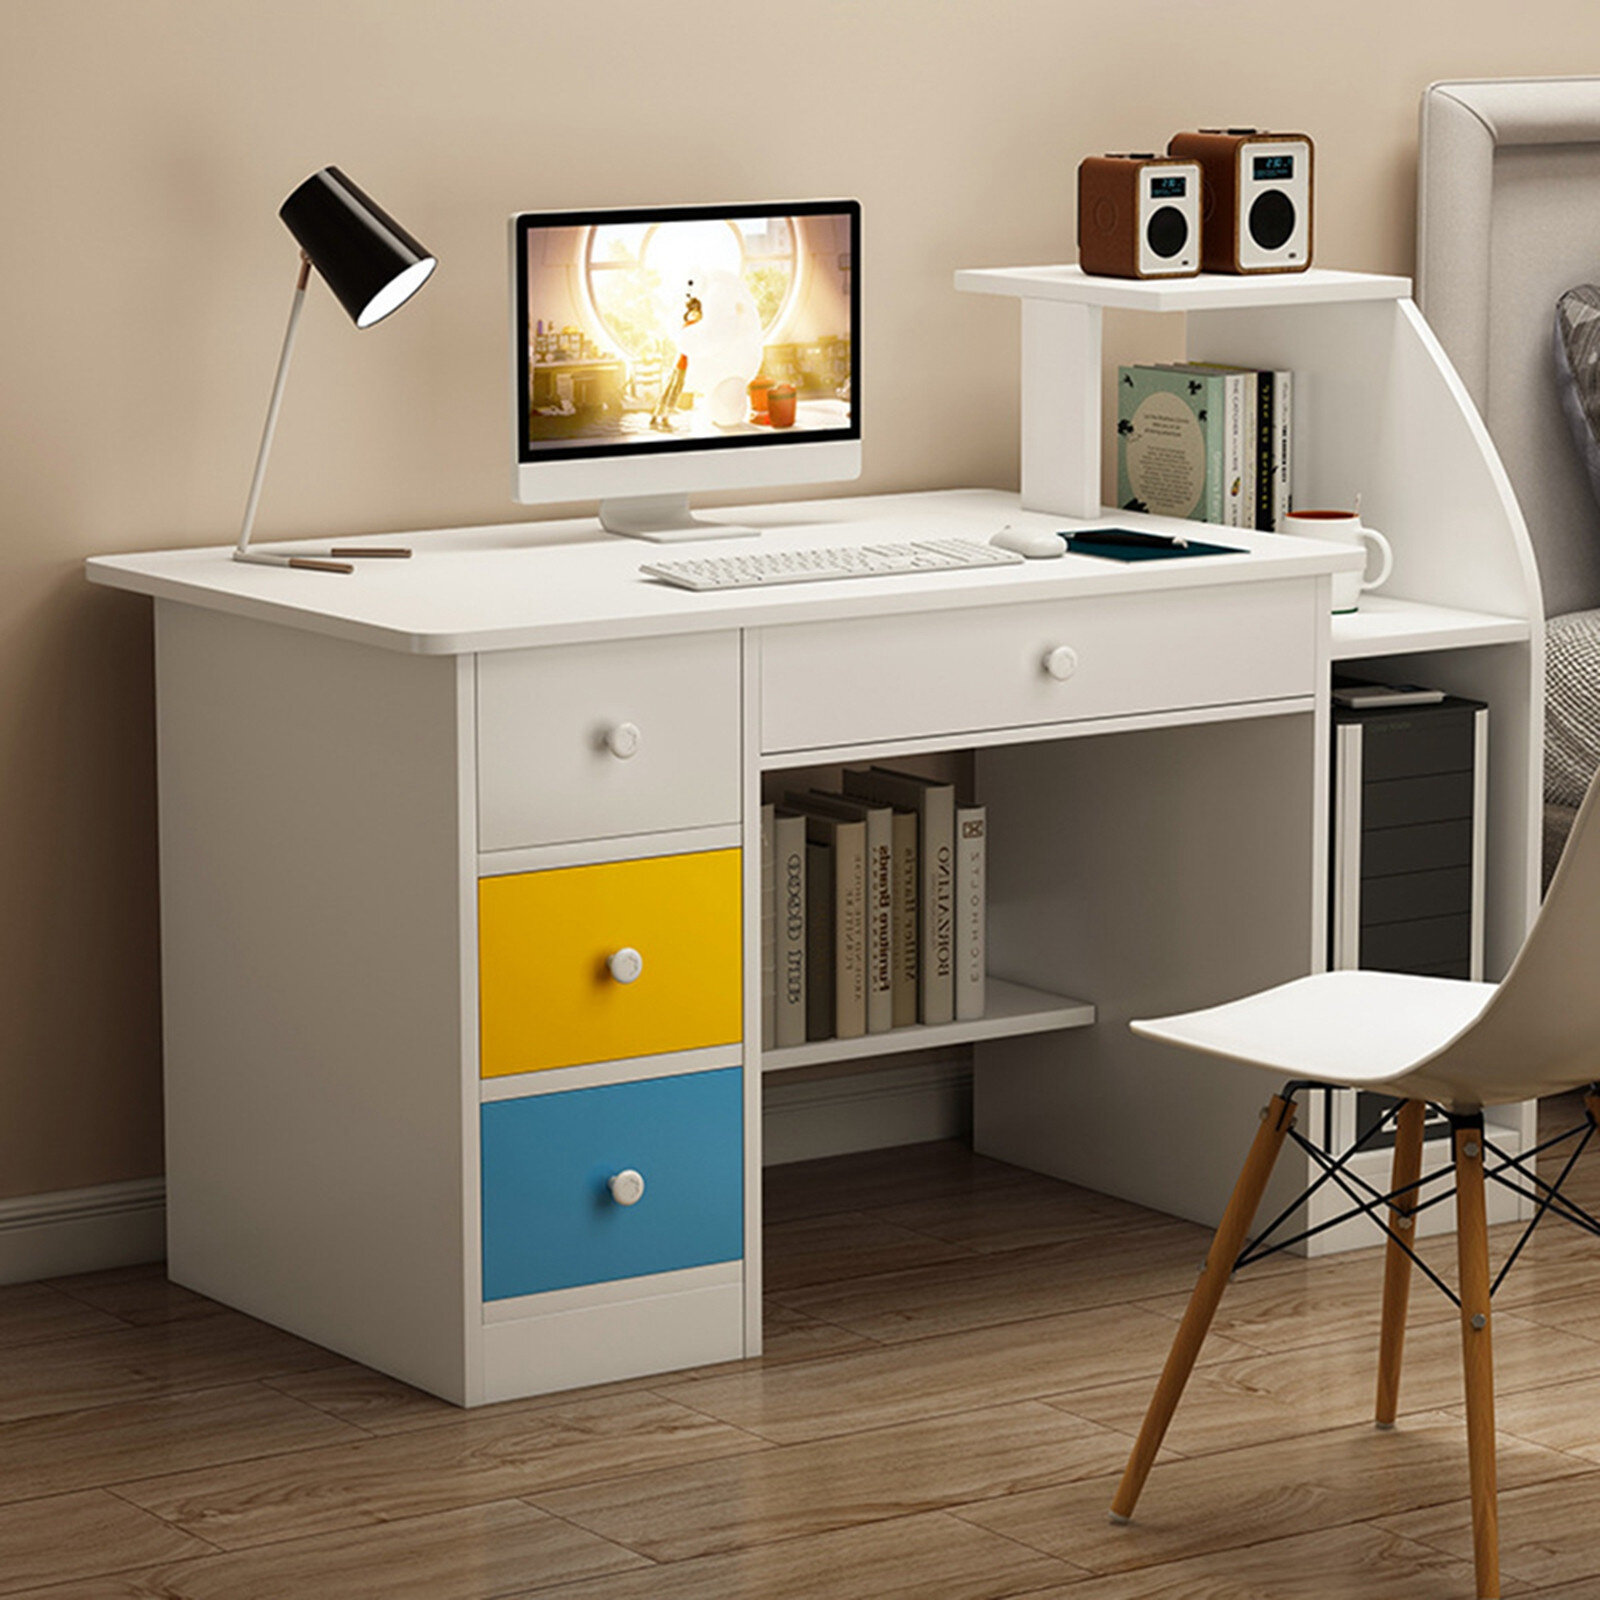 Ebern Designs Simpleness Laptop Computer Desk With Drawer Shelf Office Home Modern Small Desk